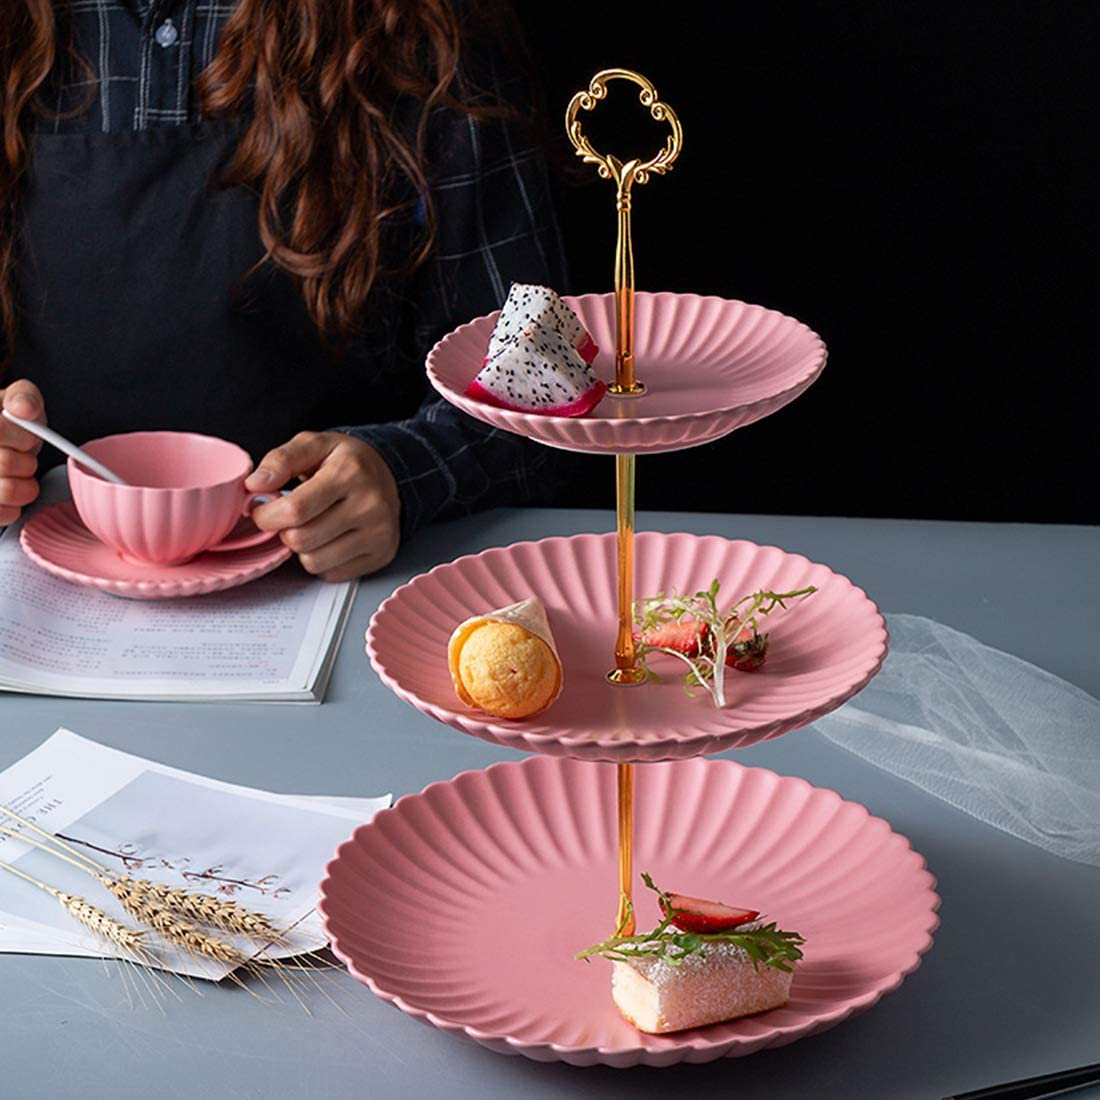 Amazon.com: BonNoces - Bandeja de porcelana para cupcakes de ...